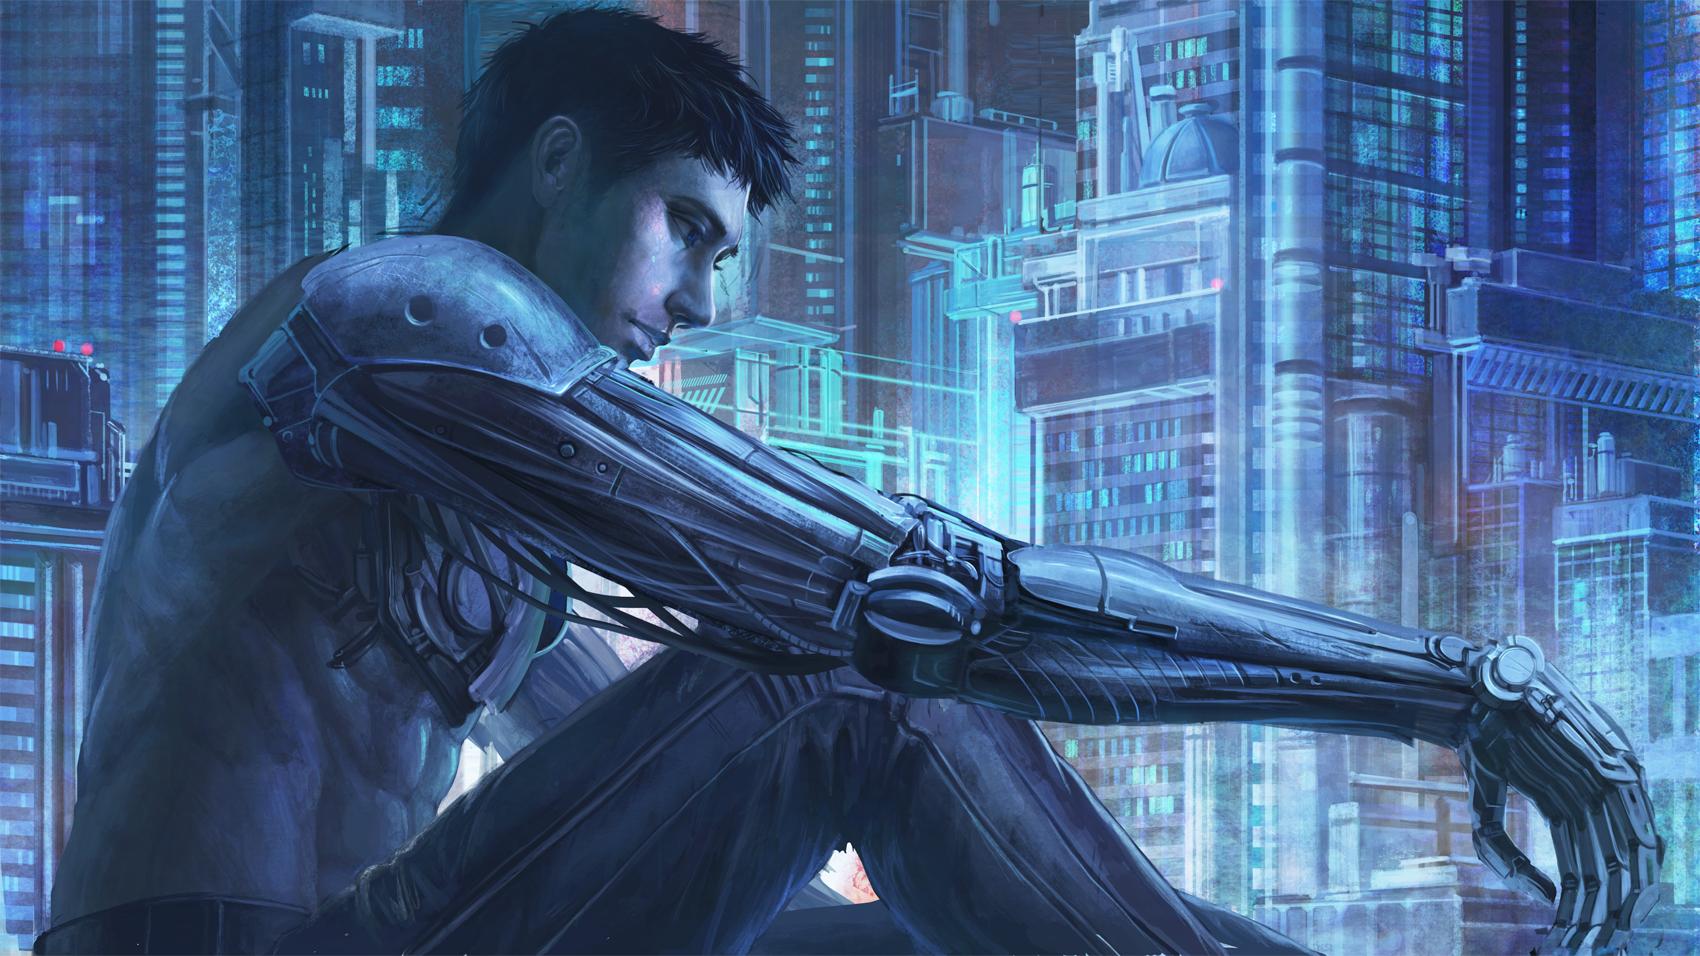 Cyborg by TaKe-bamboo